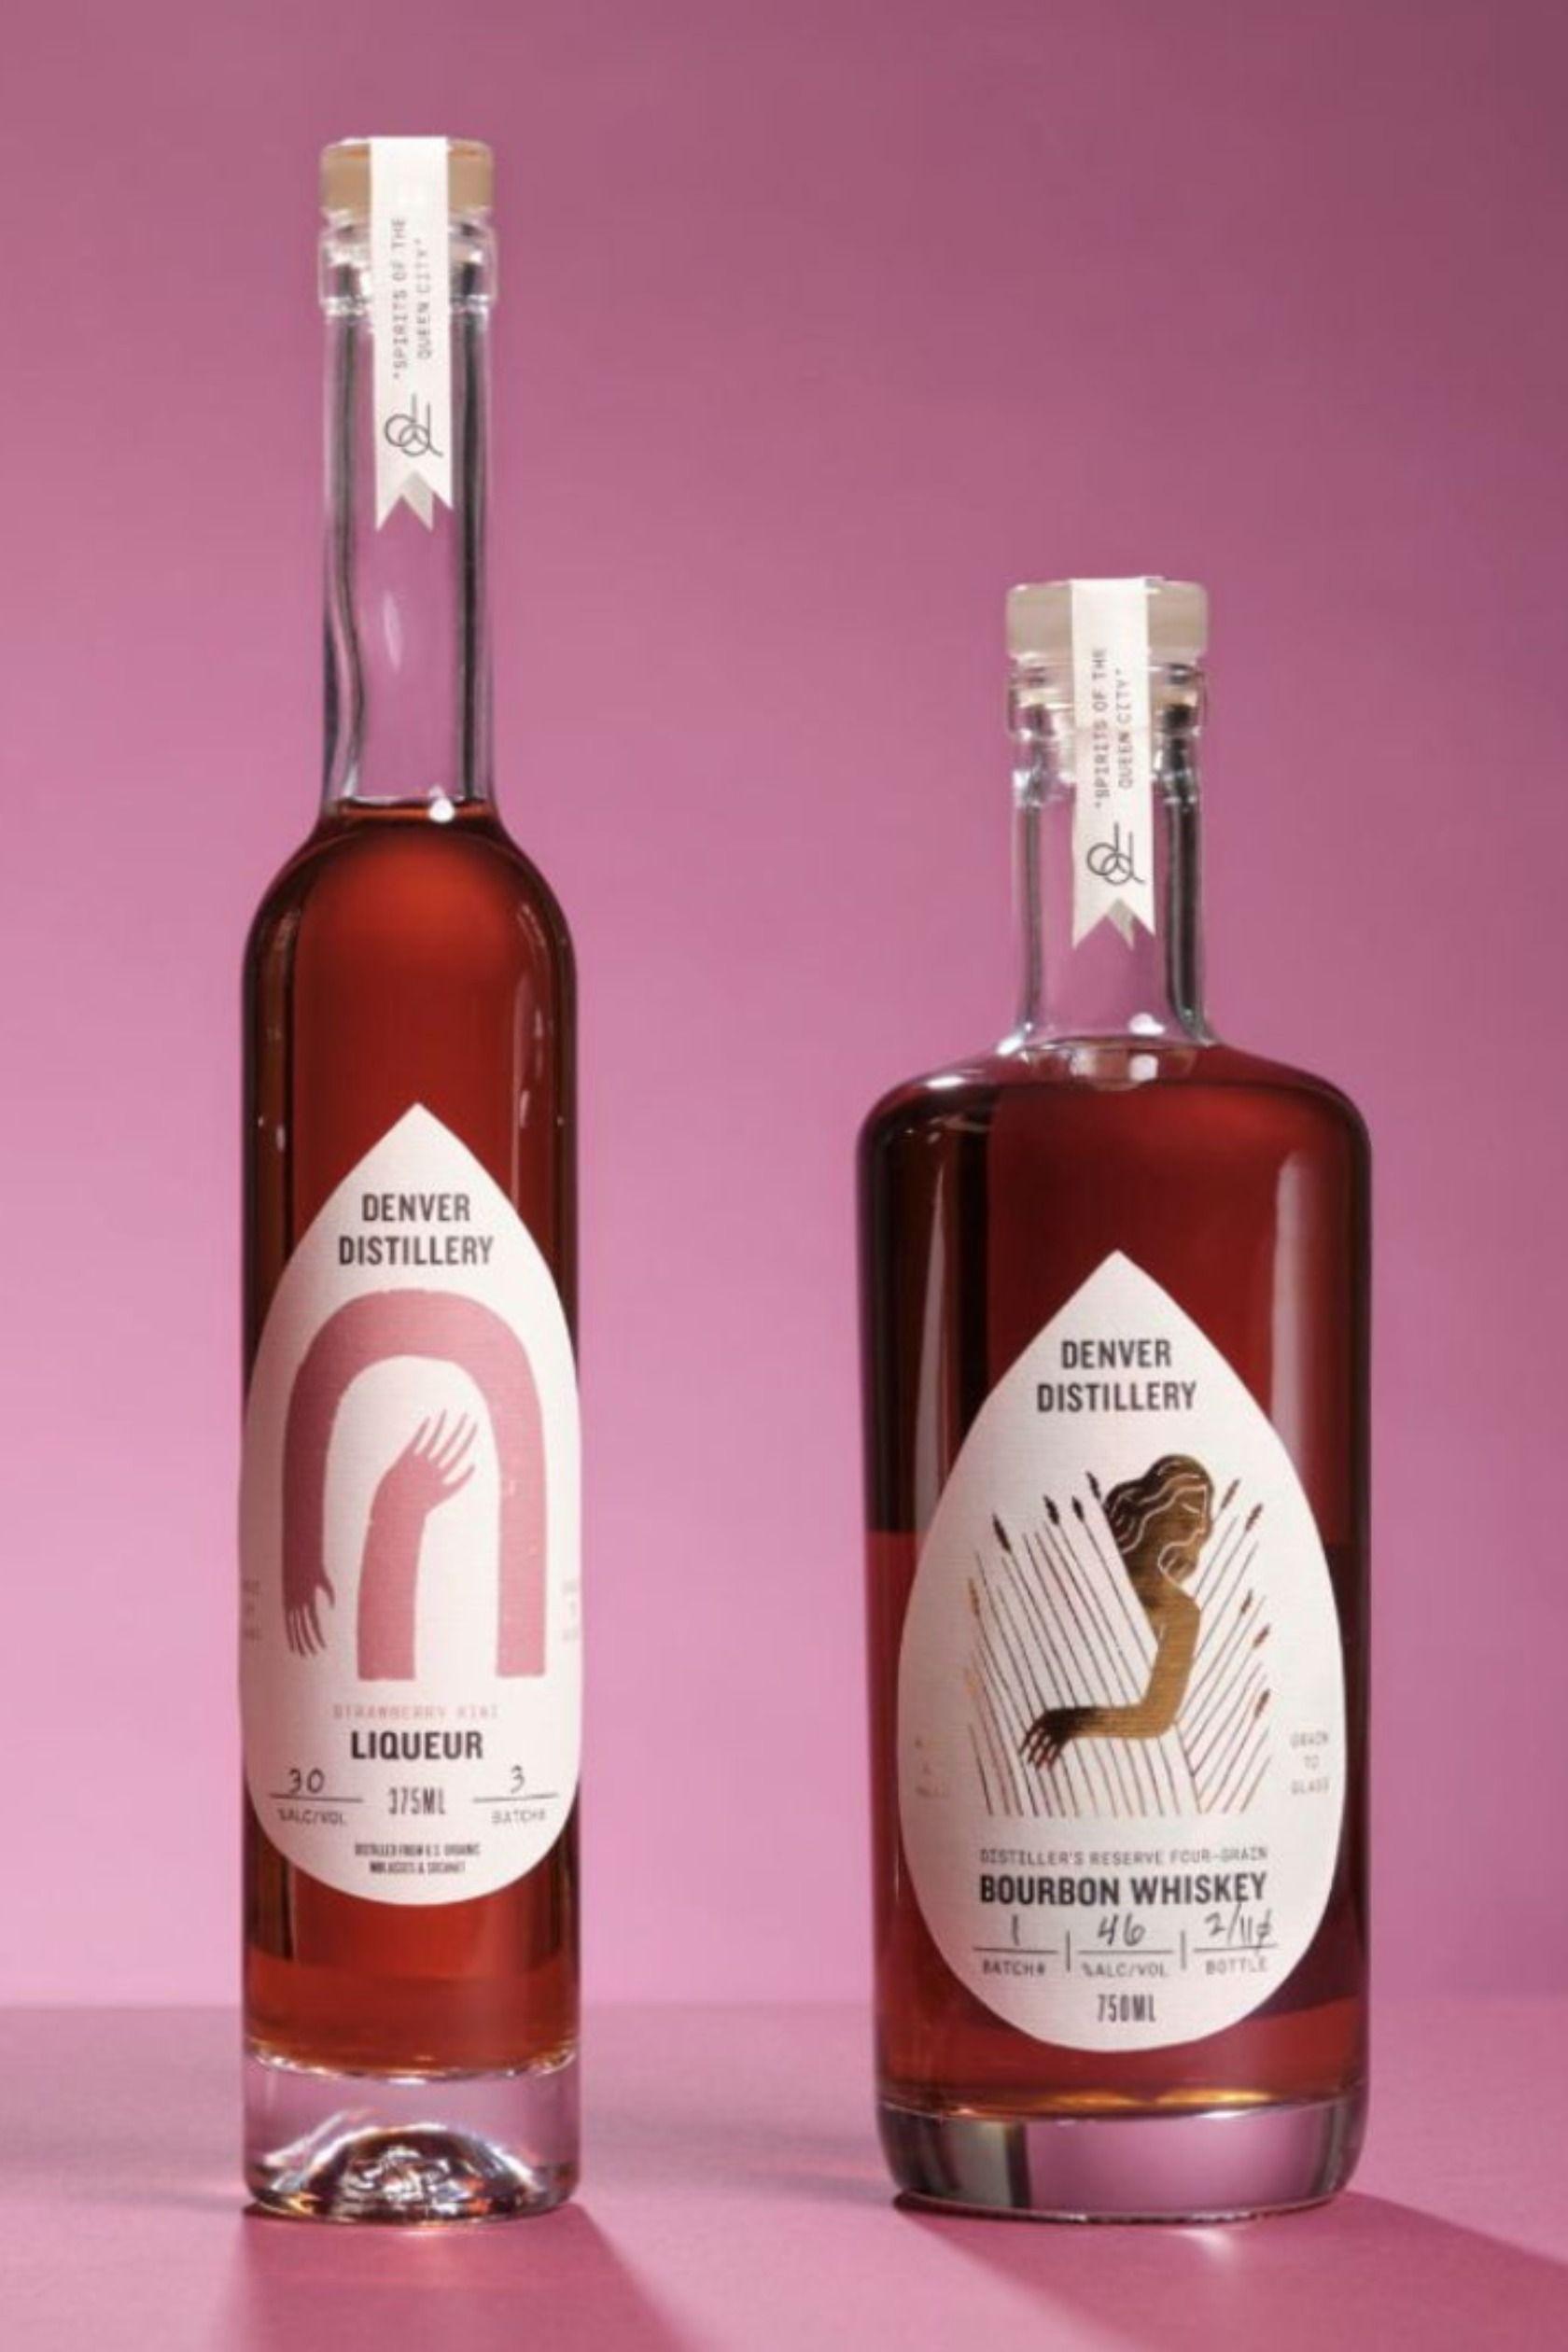 Denver Distillery S New Label System Is A Unified Knockout In 2020 Distillery Liquor Bottle Labels Gin Bottles